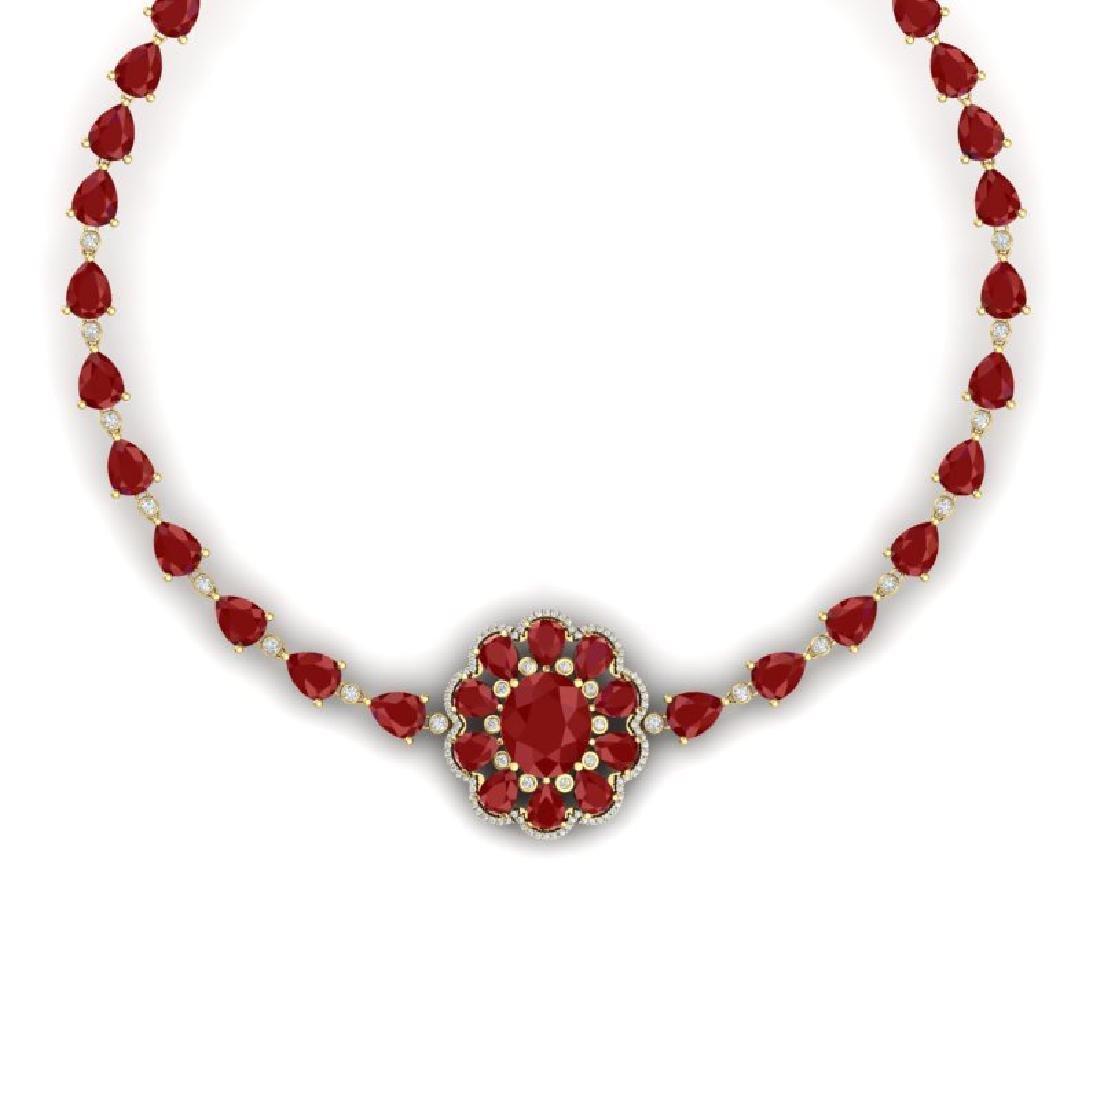 78.98 CTW Royalty Ruby & VS Diamond Necklace 18K Yellow - 2